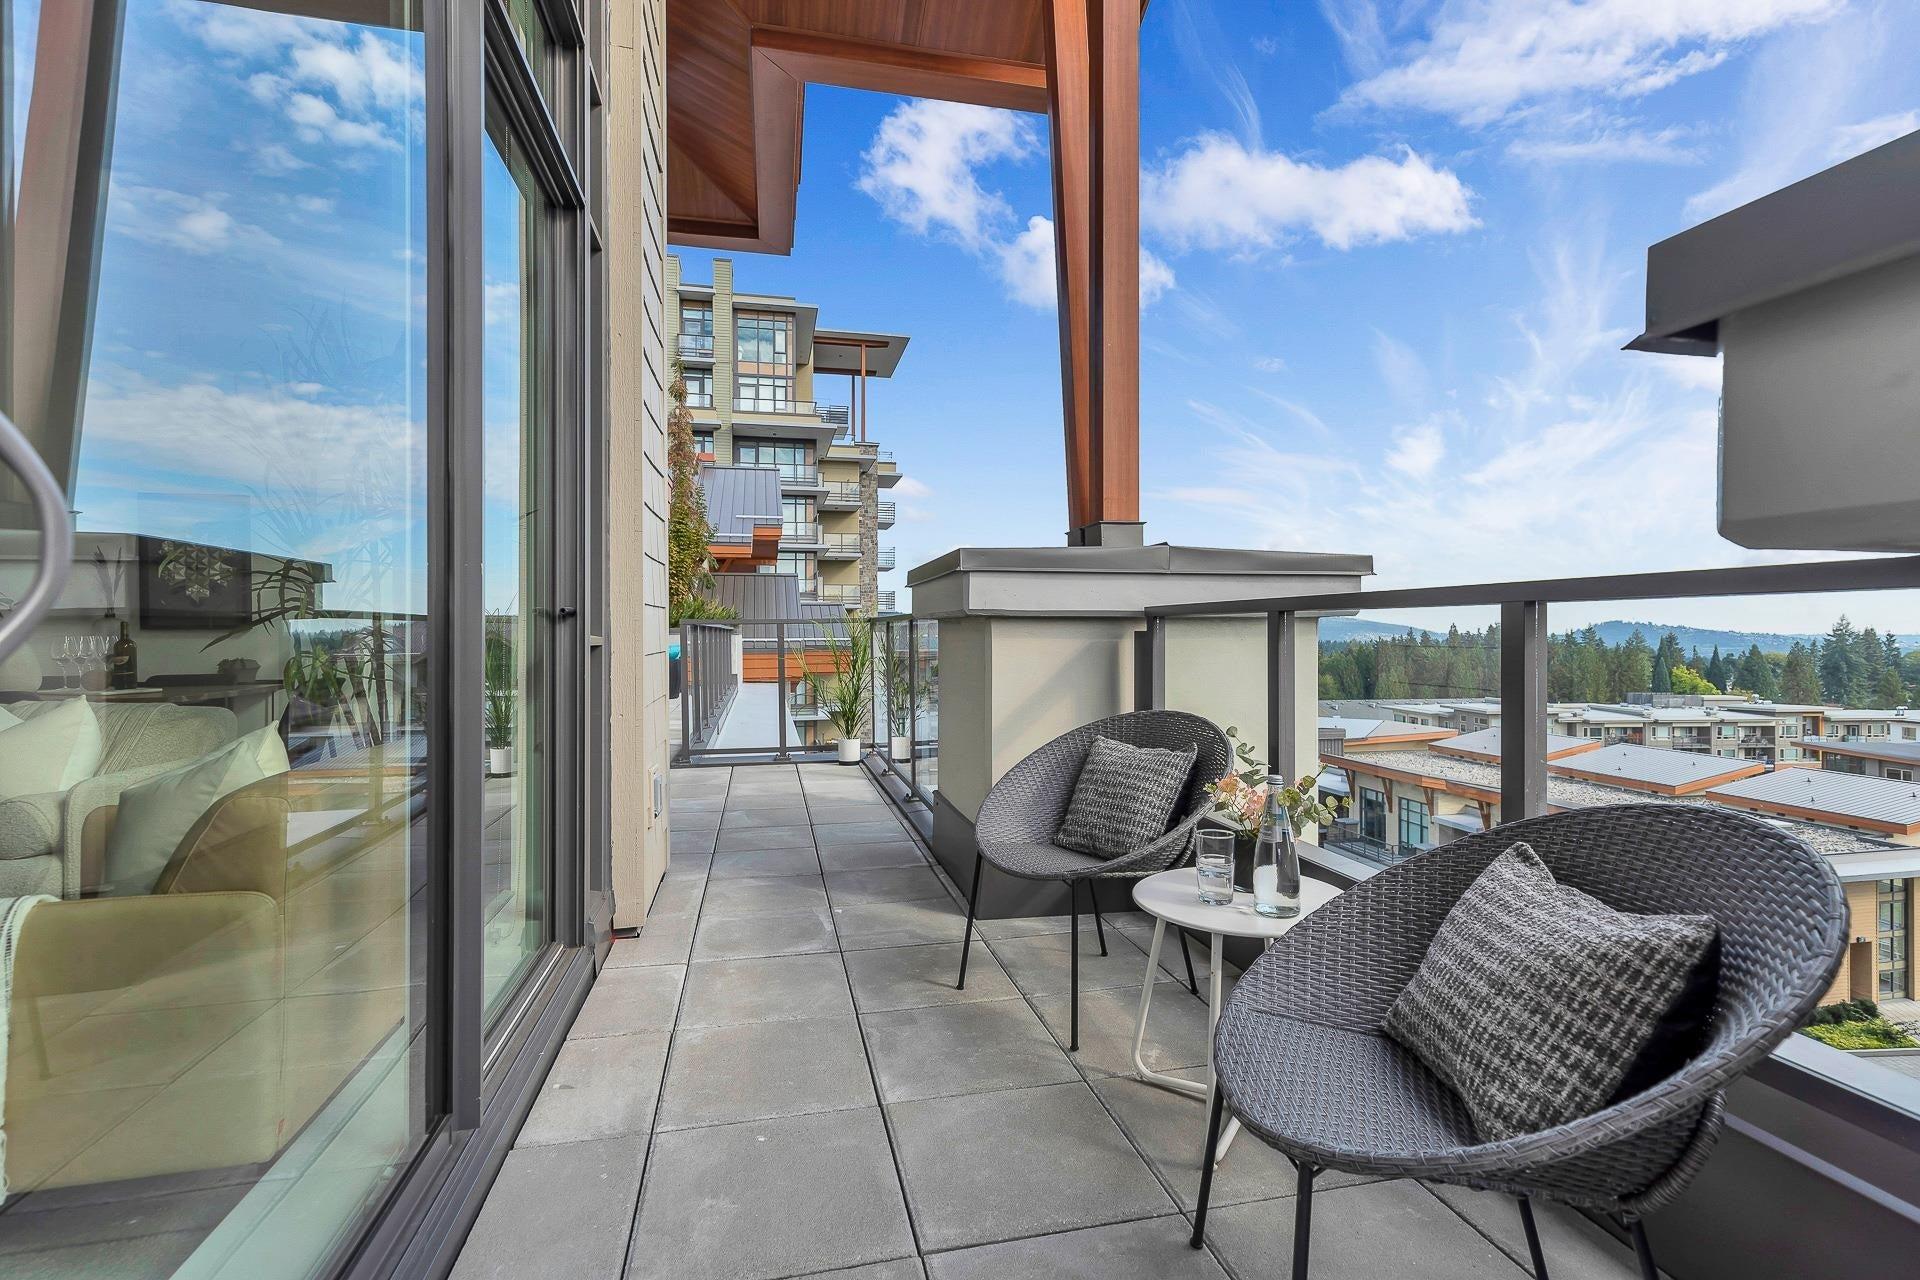 702 2780 VALLEY CENTRE AVENUE - Lynn Valley Apartment/Condo for sale, 3 Bedrooms (R2622279) - #24